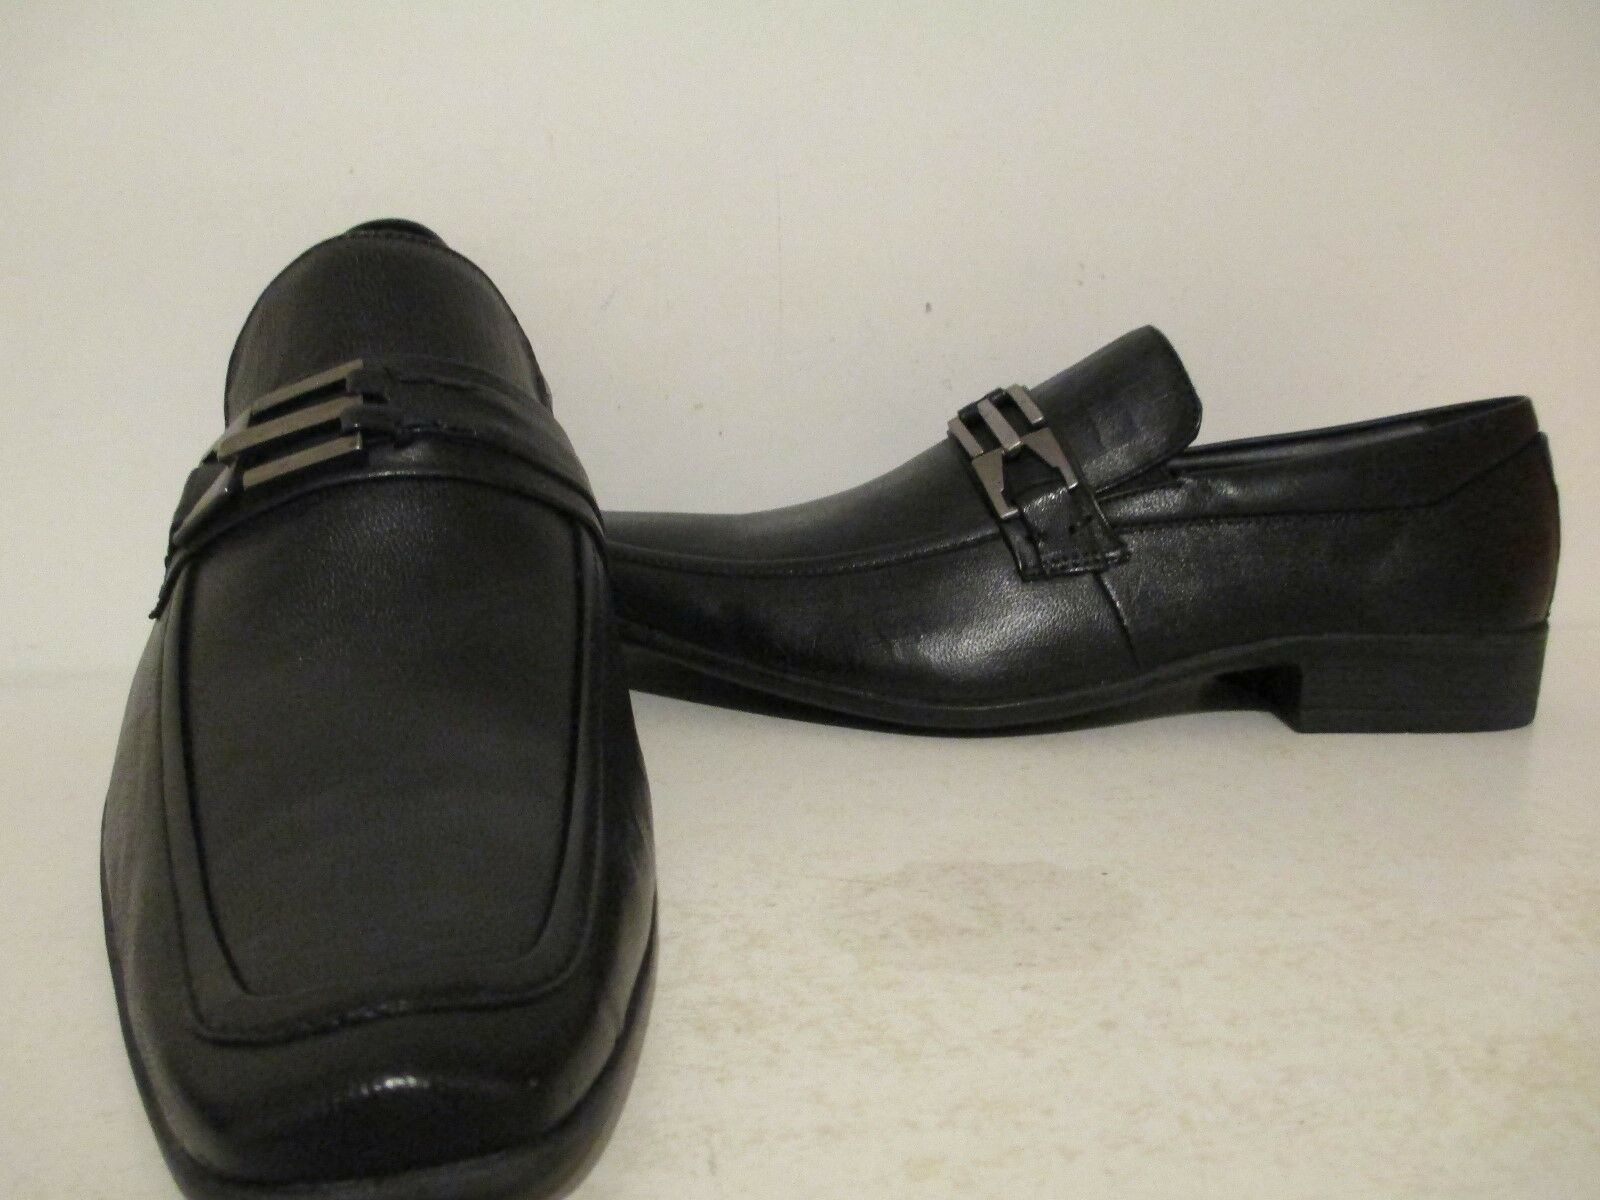 Giorgio Brutini Mens Gideon 47914 Leather Slip On Loafer shoes Black Sz 9.5 - 13